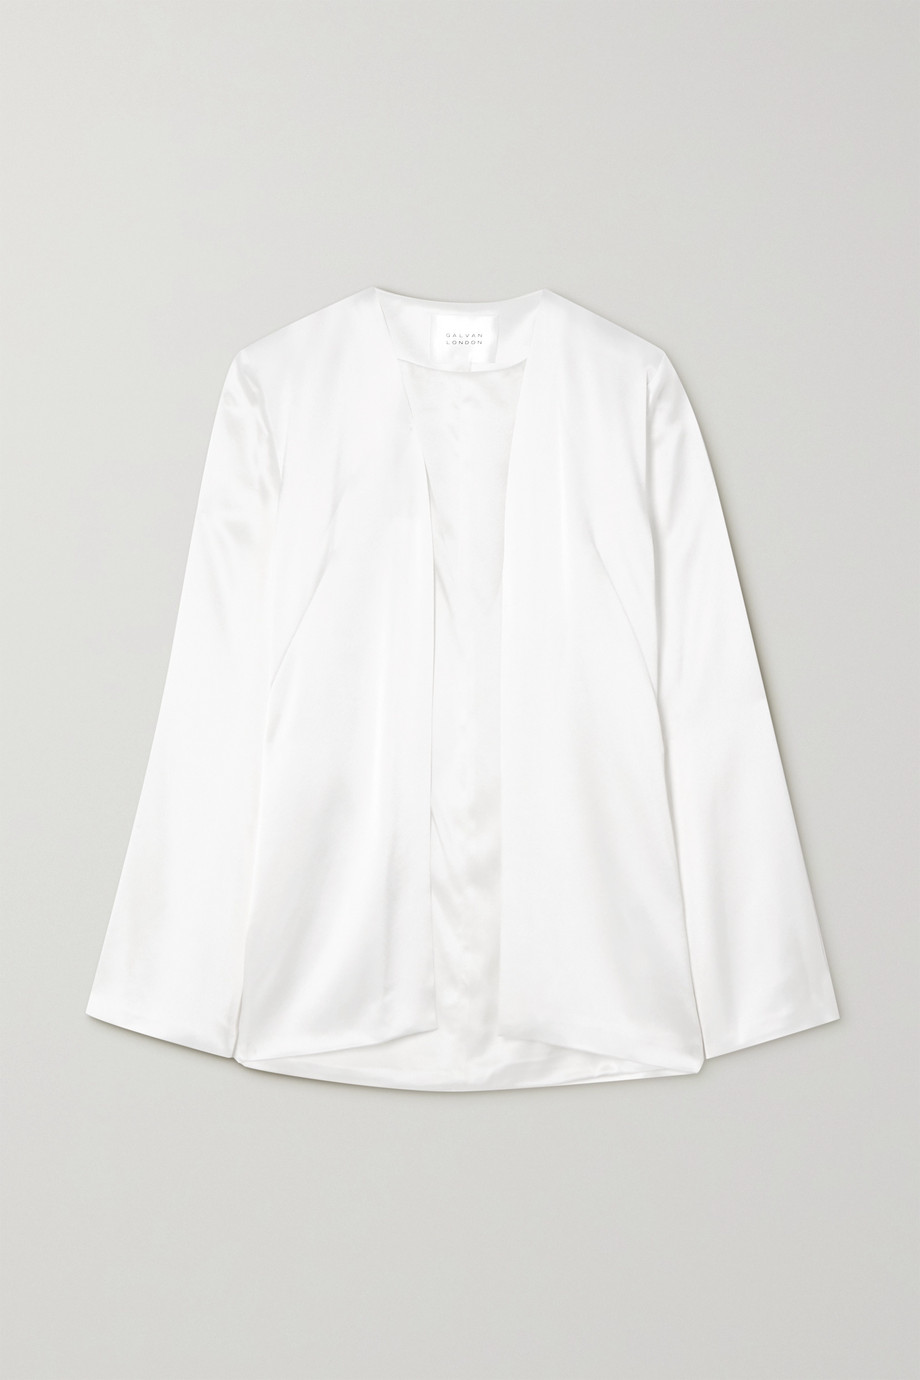 Galvan Blenheim 缎布外套